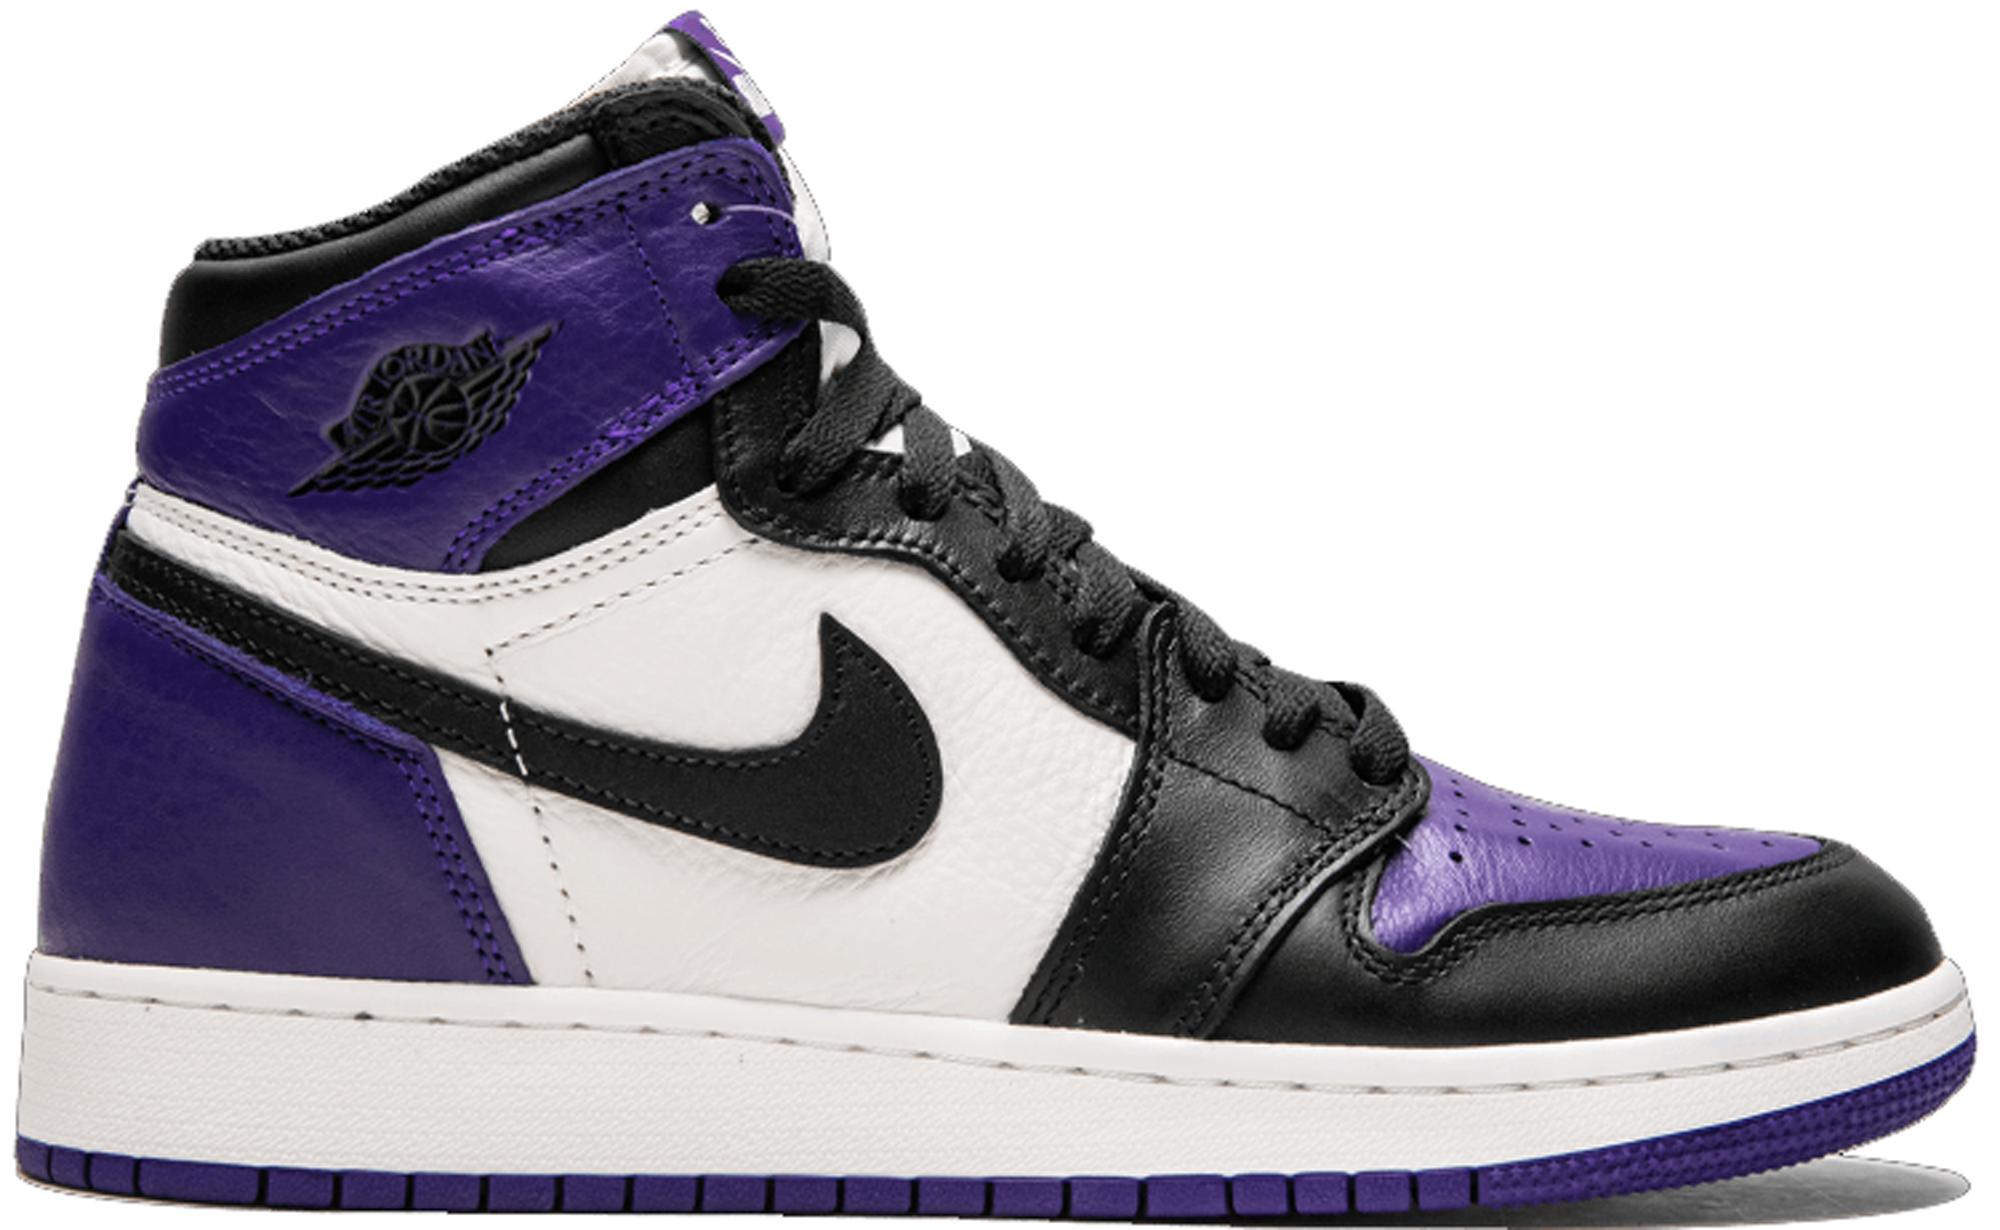 Jordan 1 Retro High Court Purple (GS